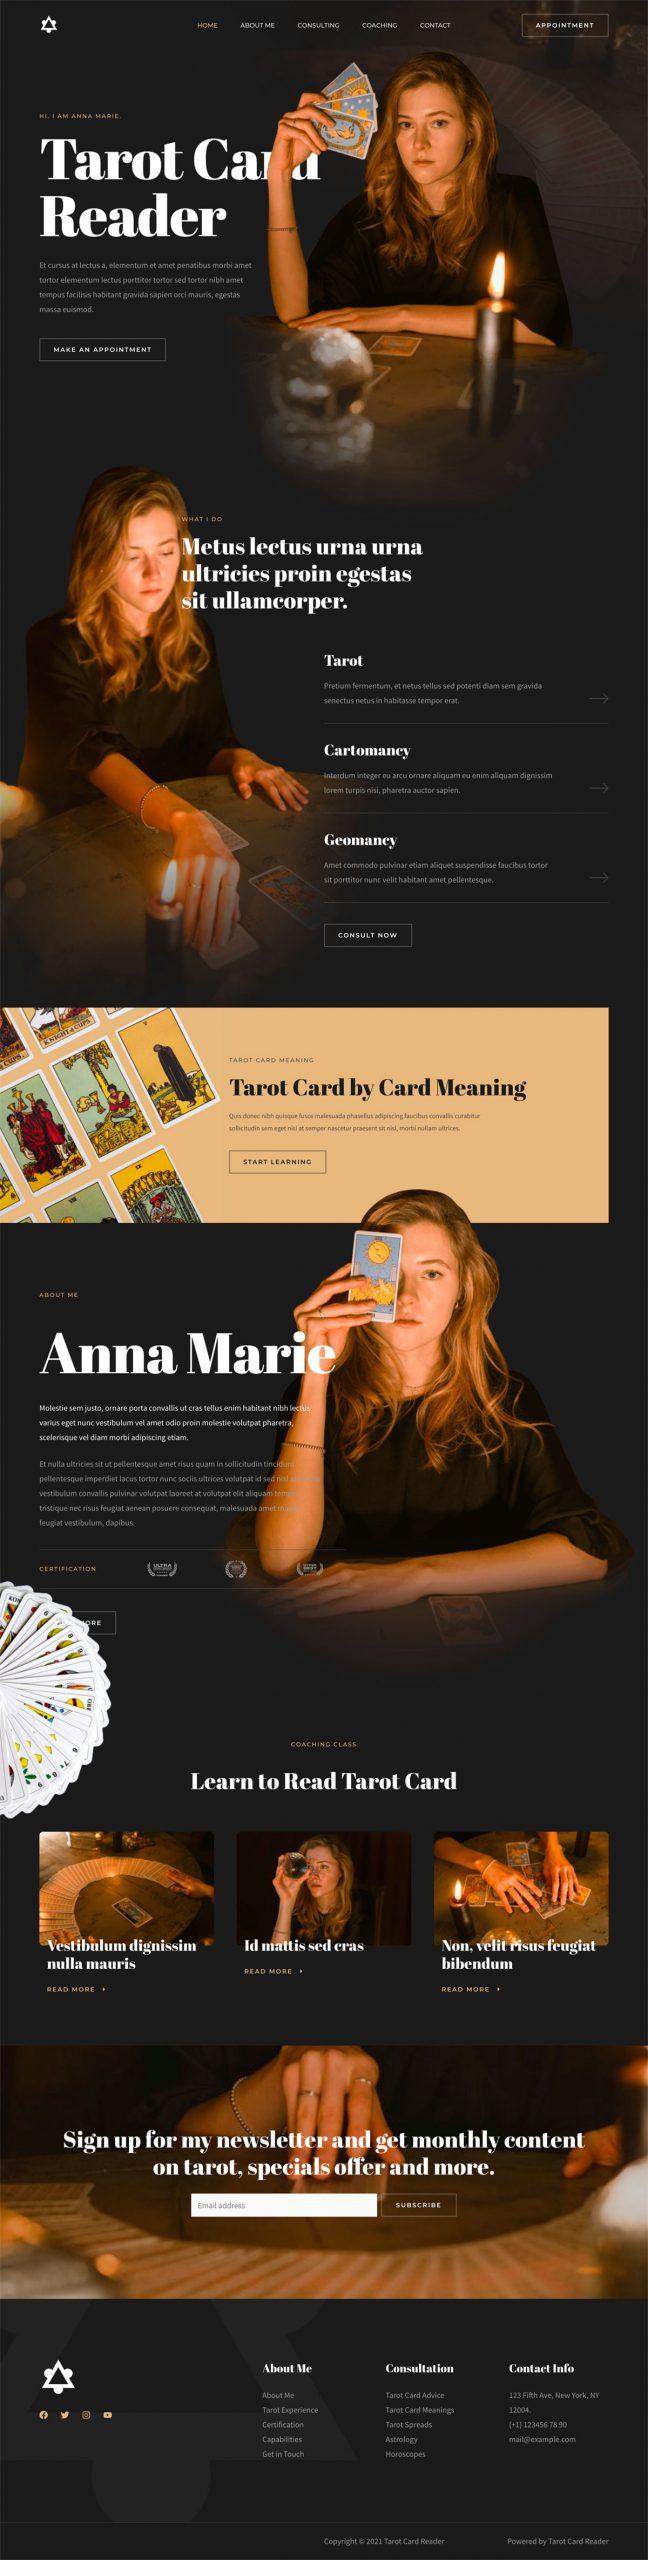 Adamo Web Design | Web Design Durham | tarot card reader 04 home scaled